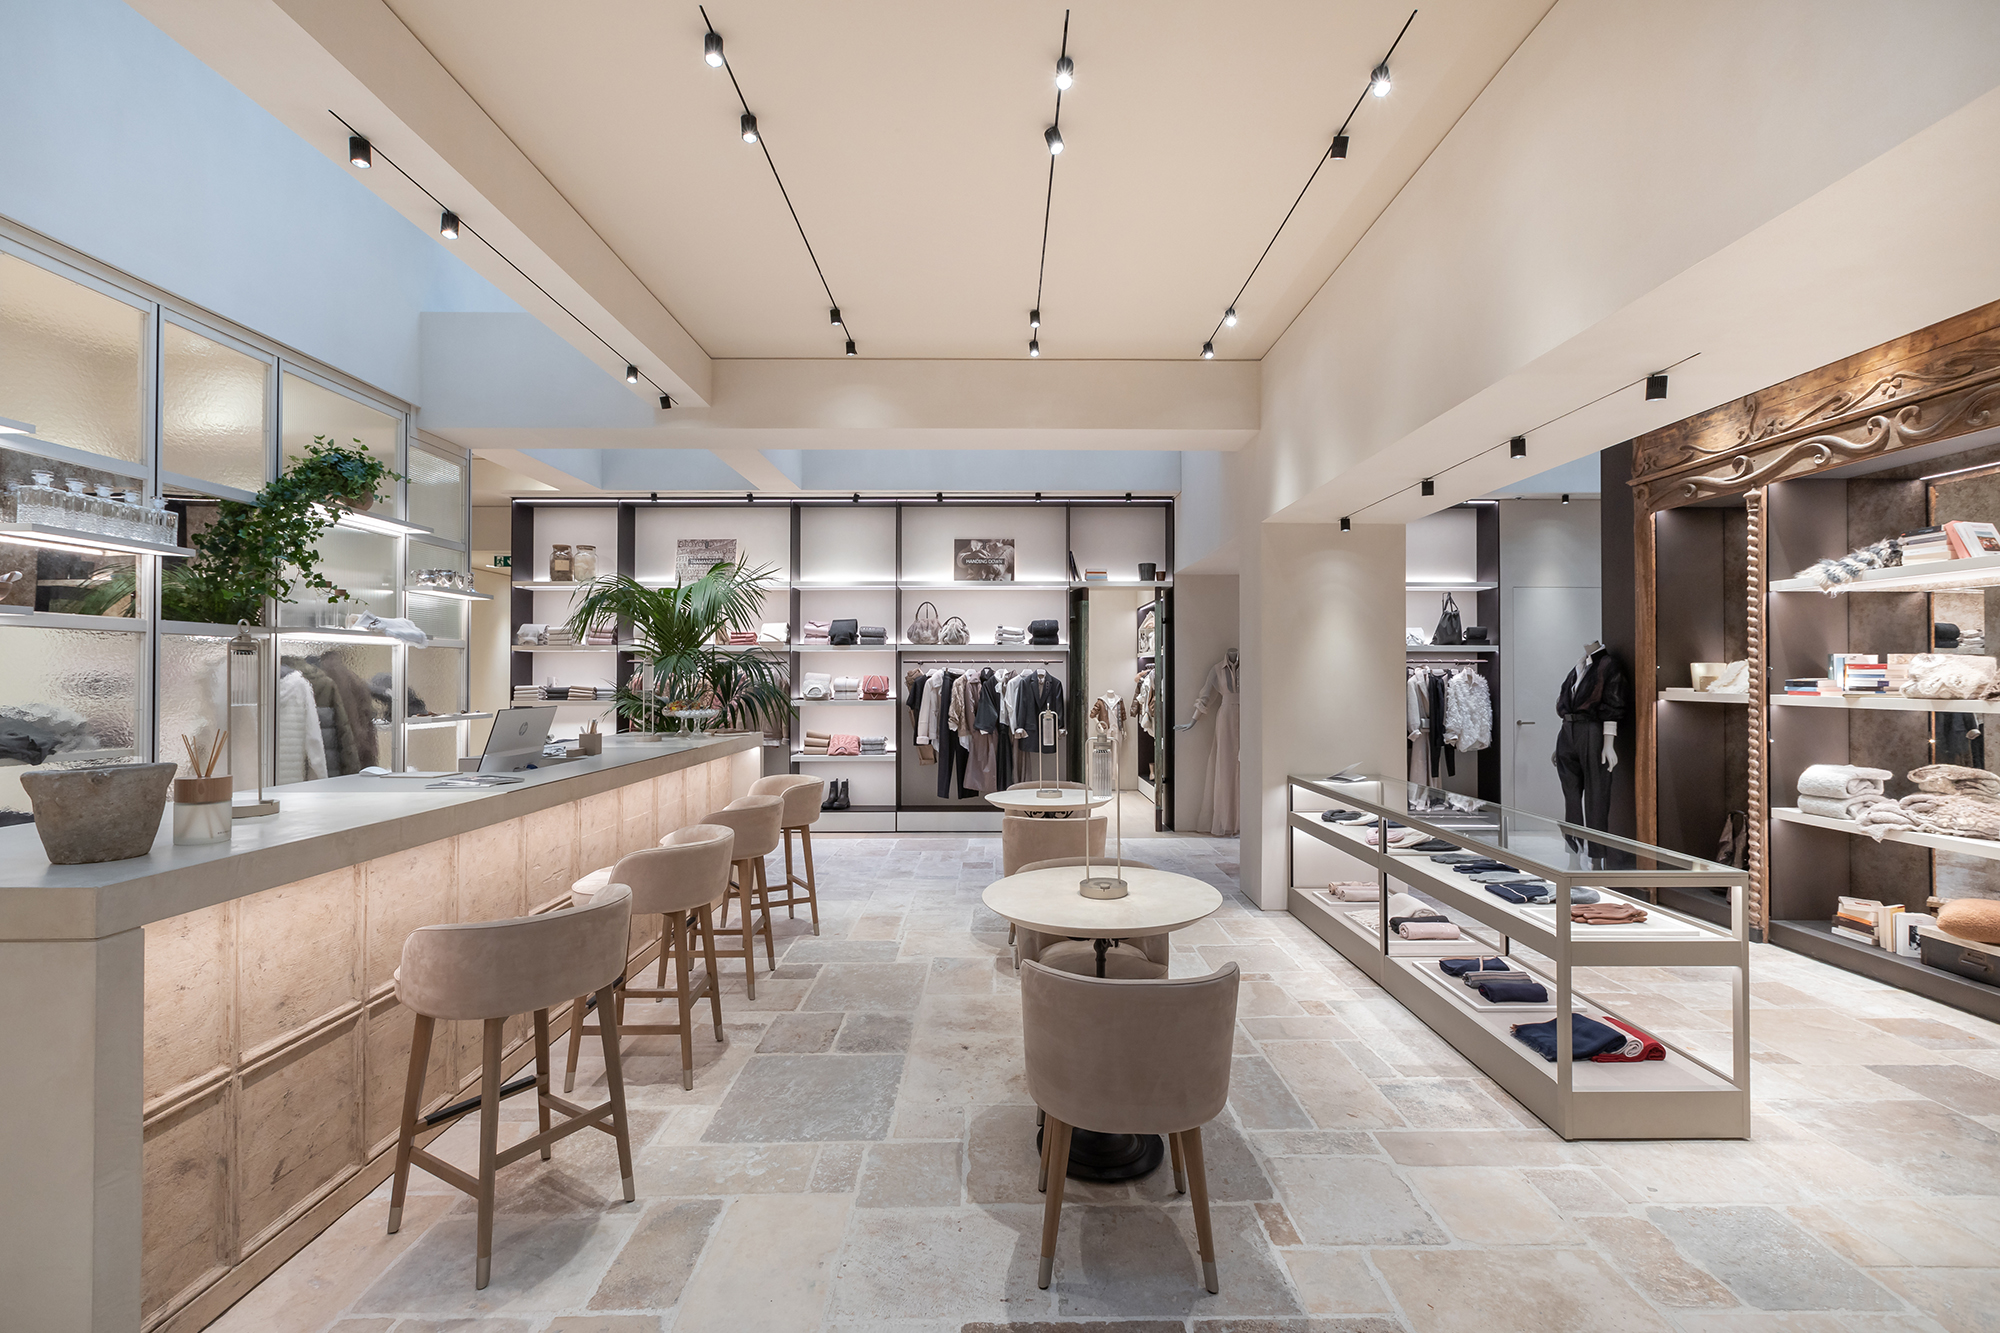 Brunello Cucinelli opens new store in Paris at Av. Montaigne